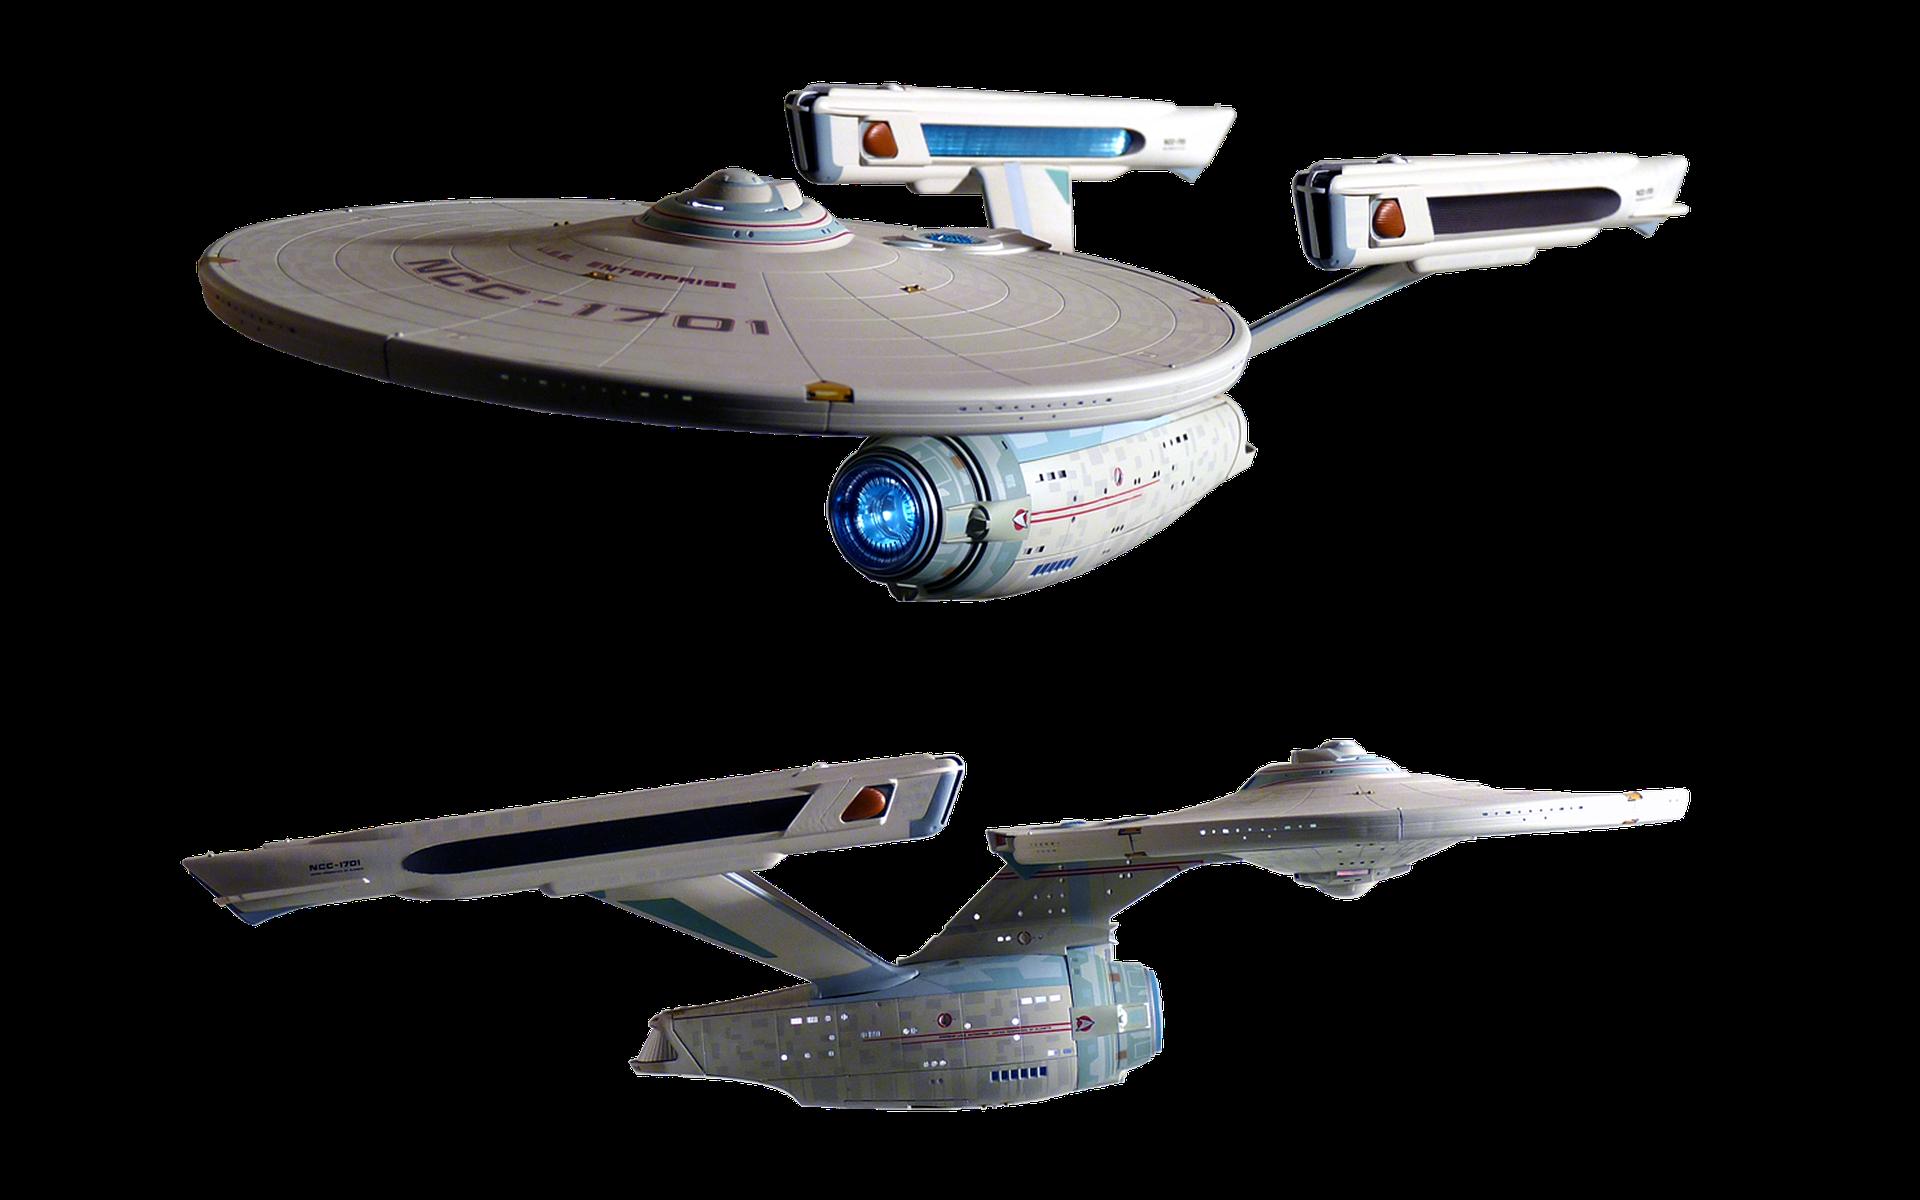 Starship enterprise clipart jpg free library Spacecraft Starship Enterprise Image Clip art - Technics ... jpg free library